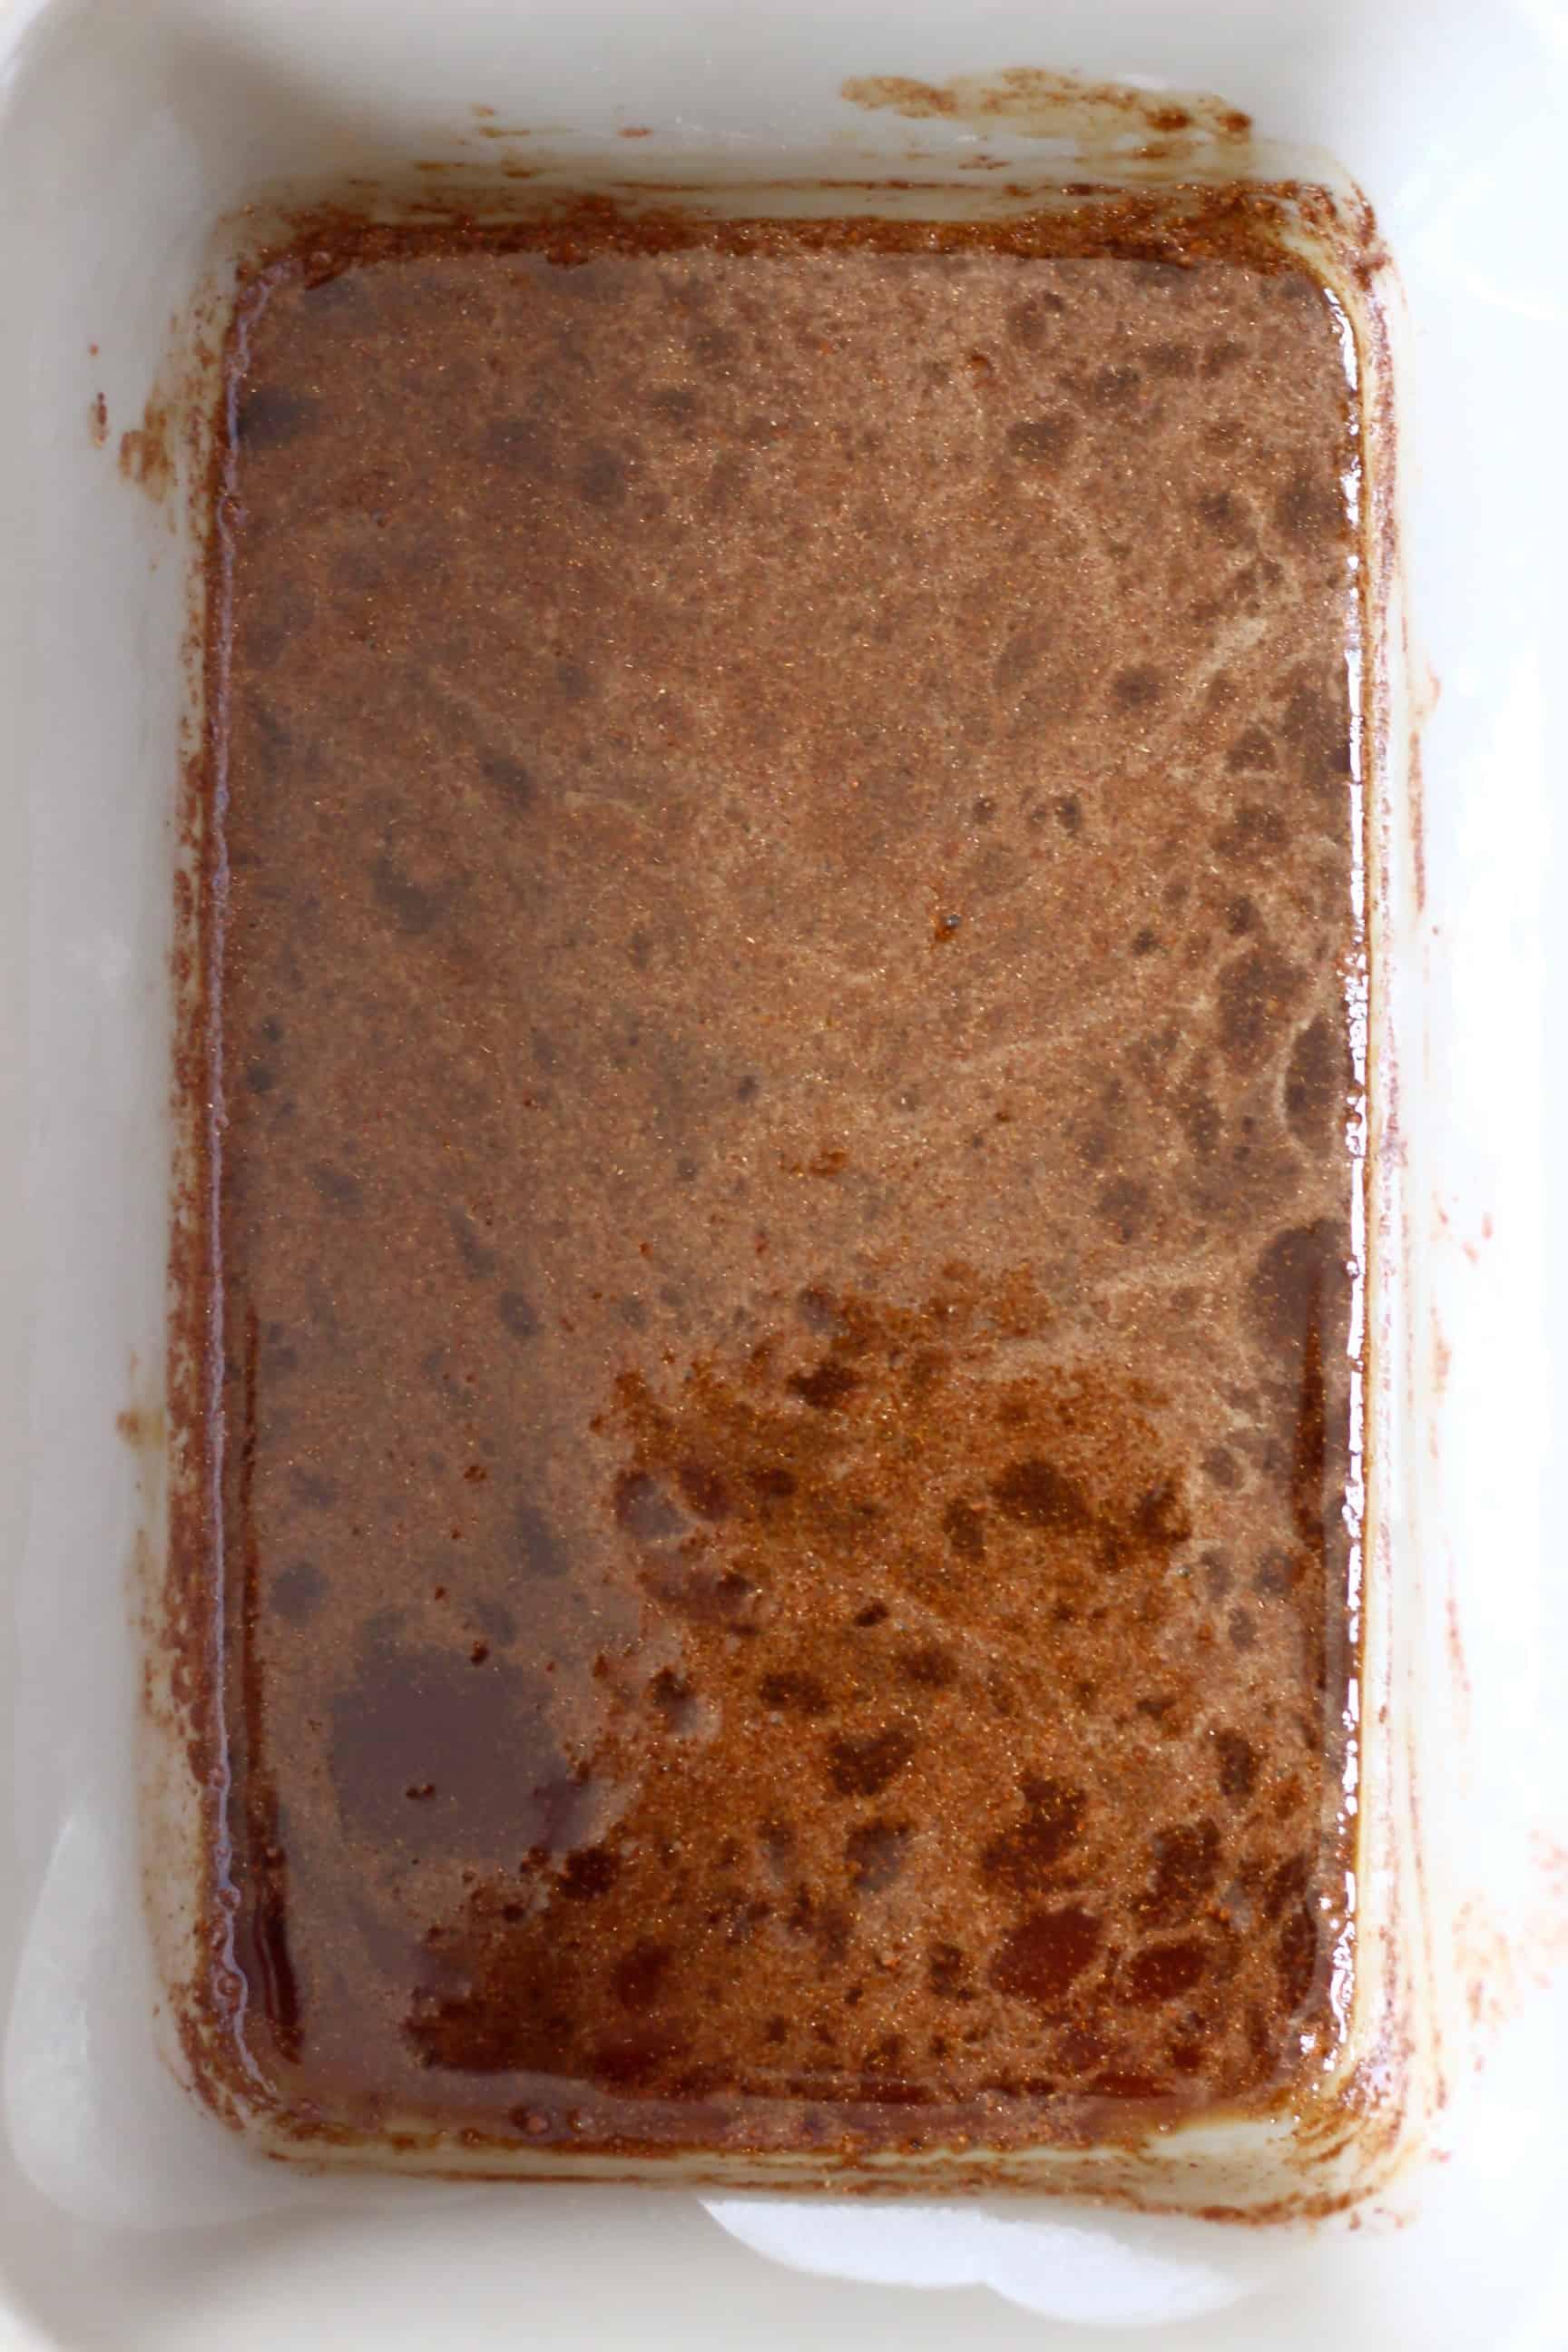 Dark brown caramel sauce for baked apples in a rectangular baking dish